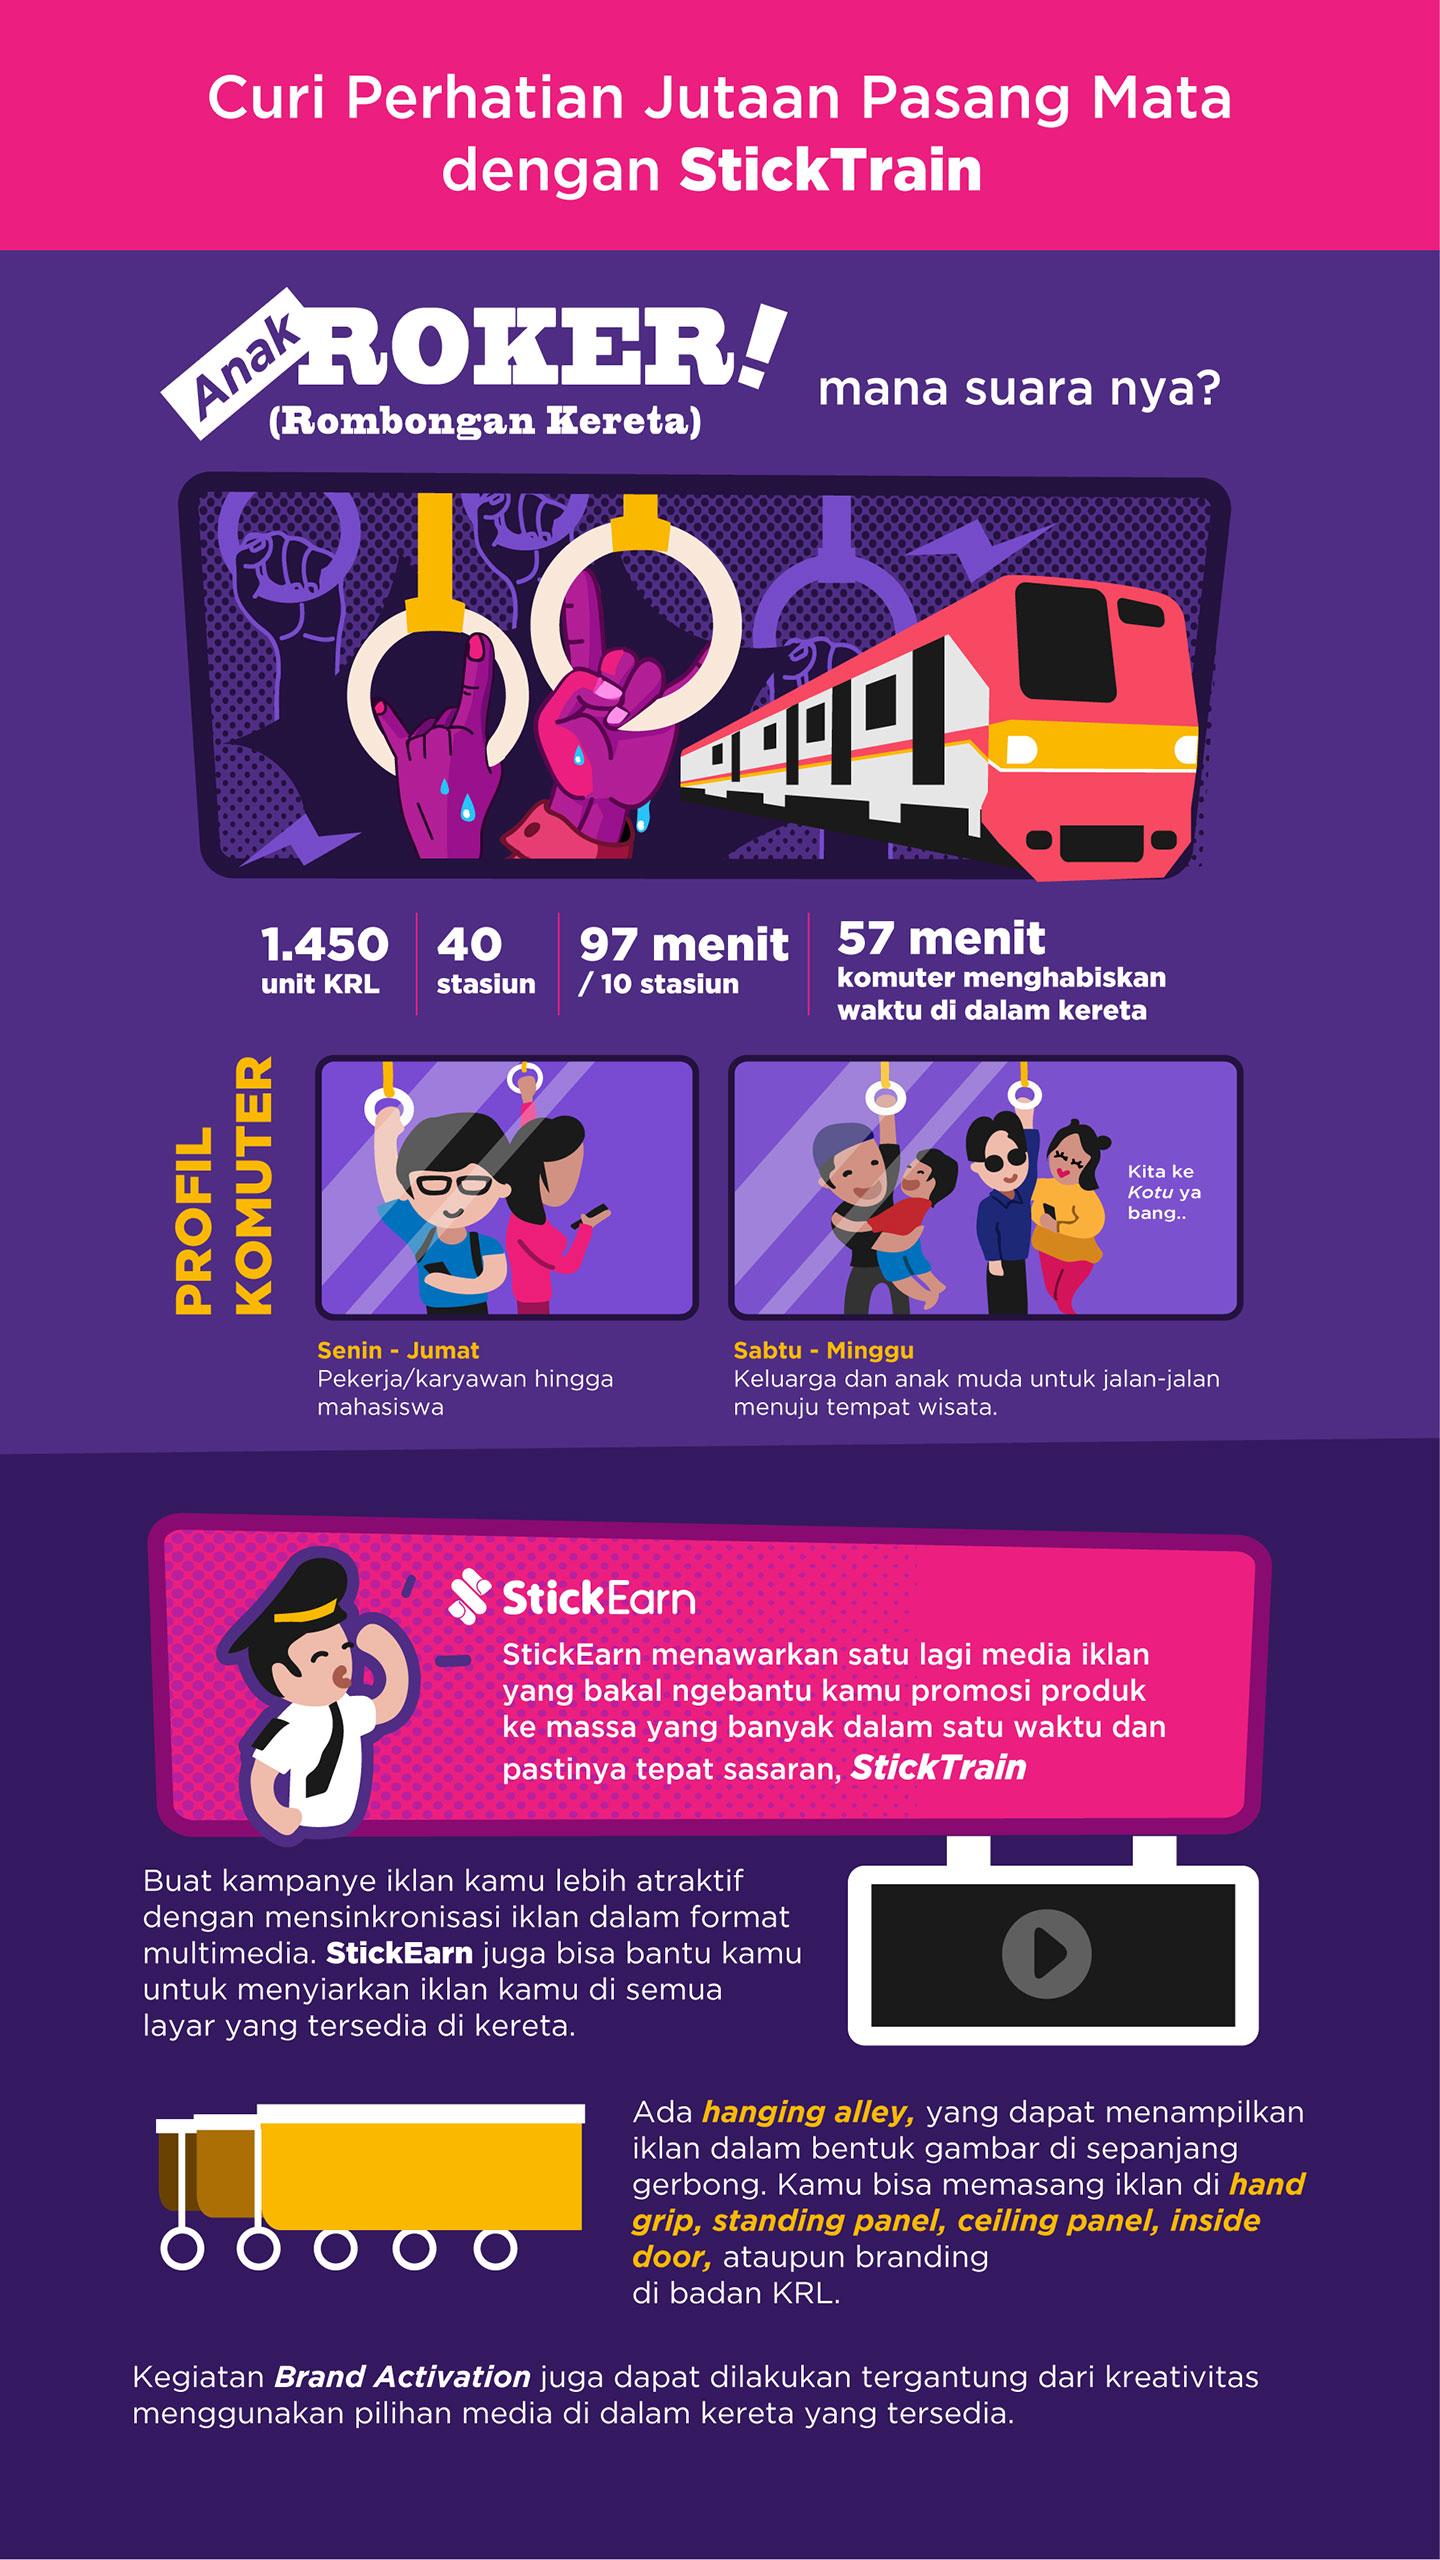 sticktrain-curi-perhatian--infographic.jpg